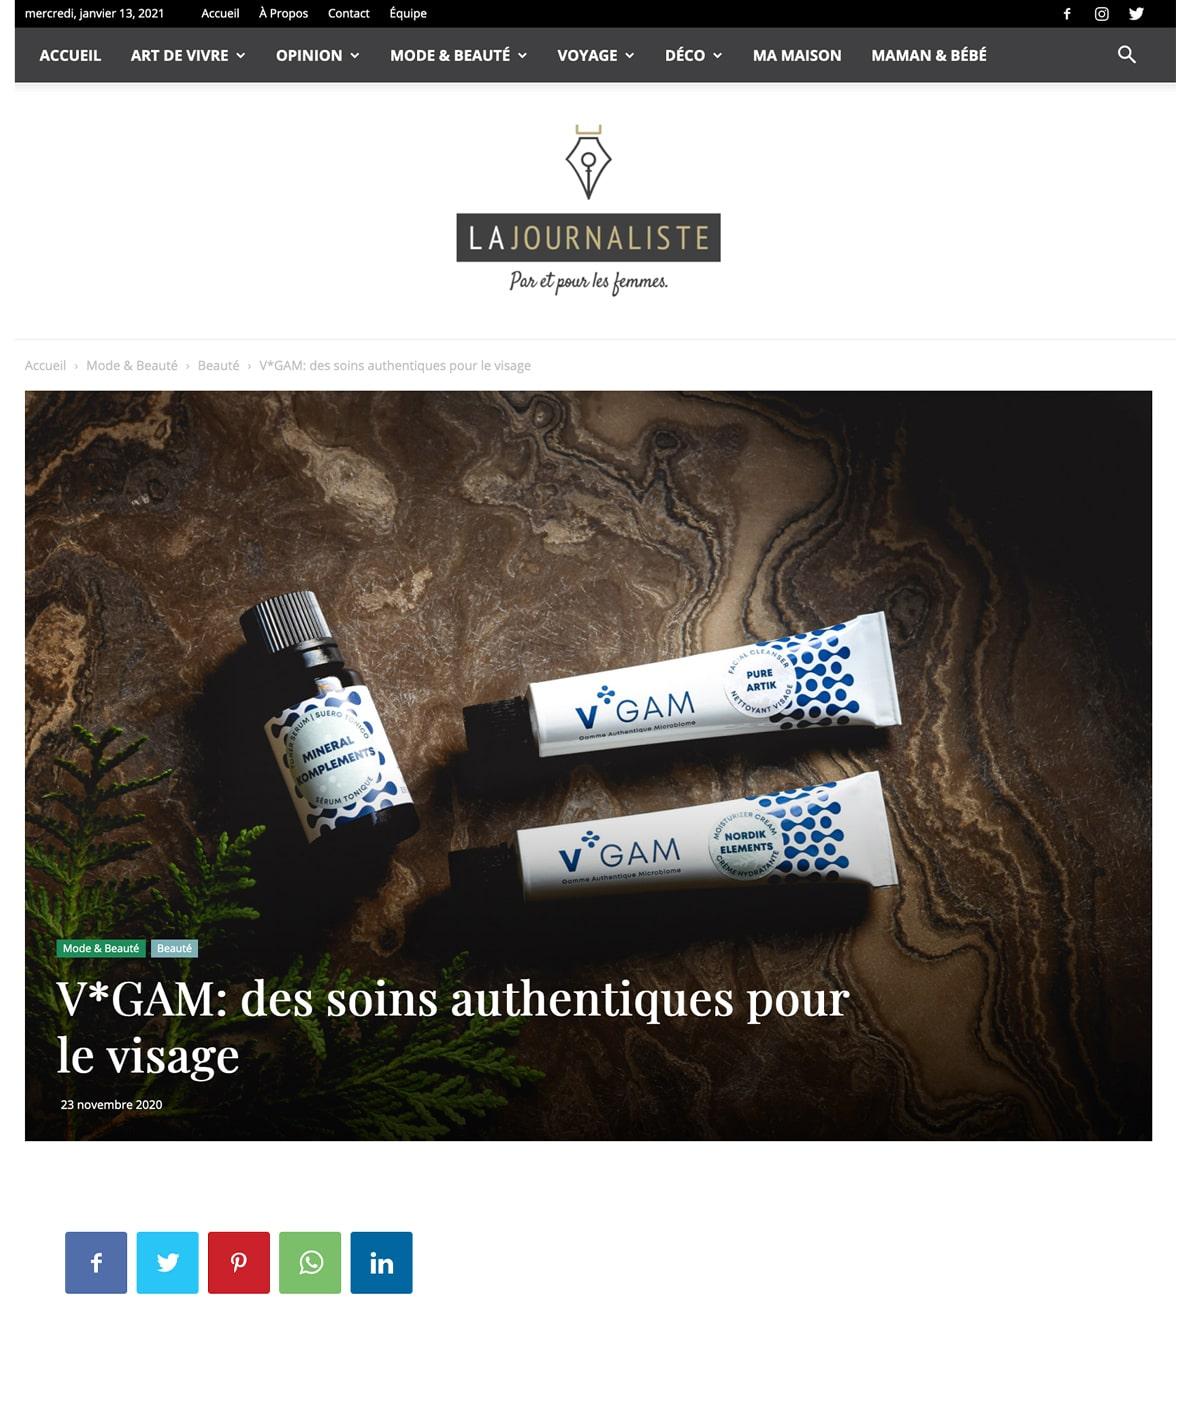 vgam-skincare-about-02_1.jpg